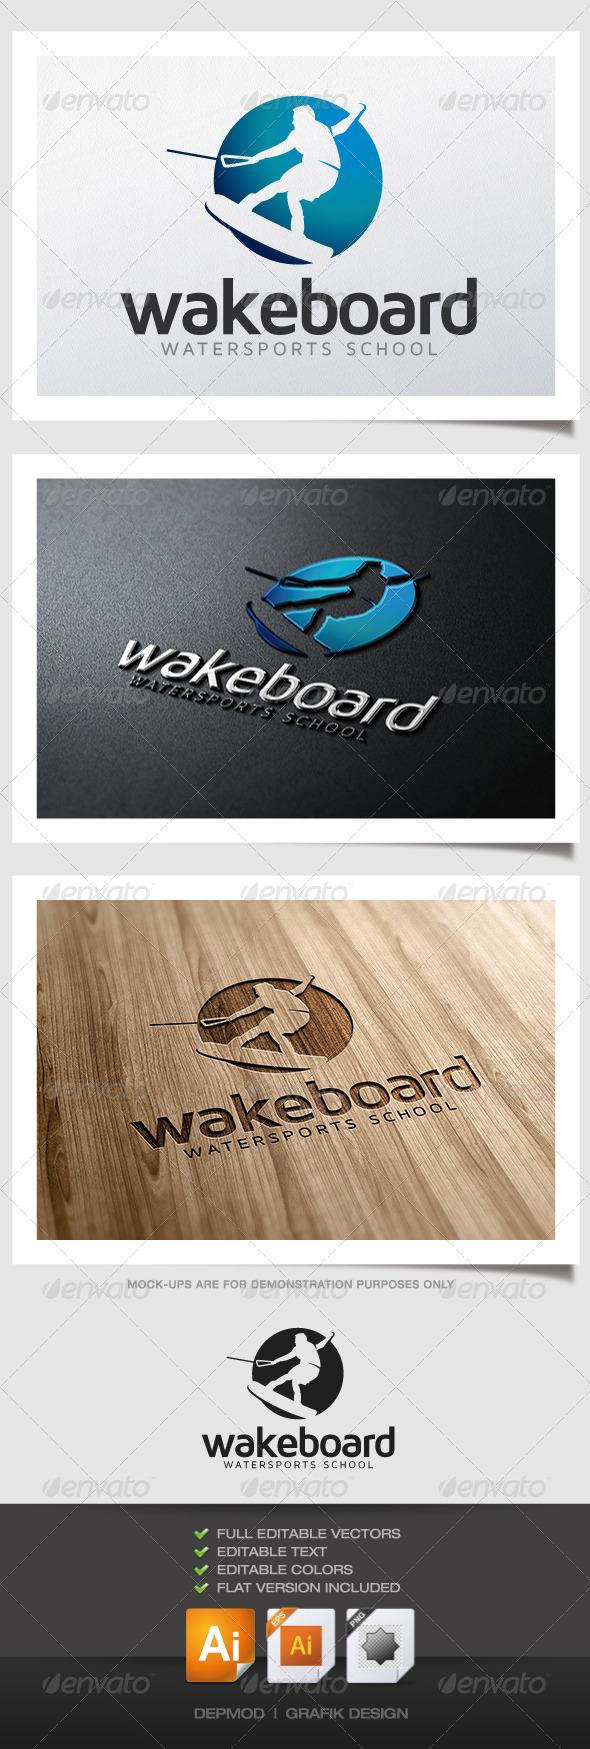 GraphicRiver Wakeboard Logo 4839451